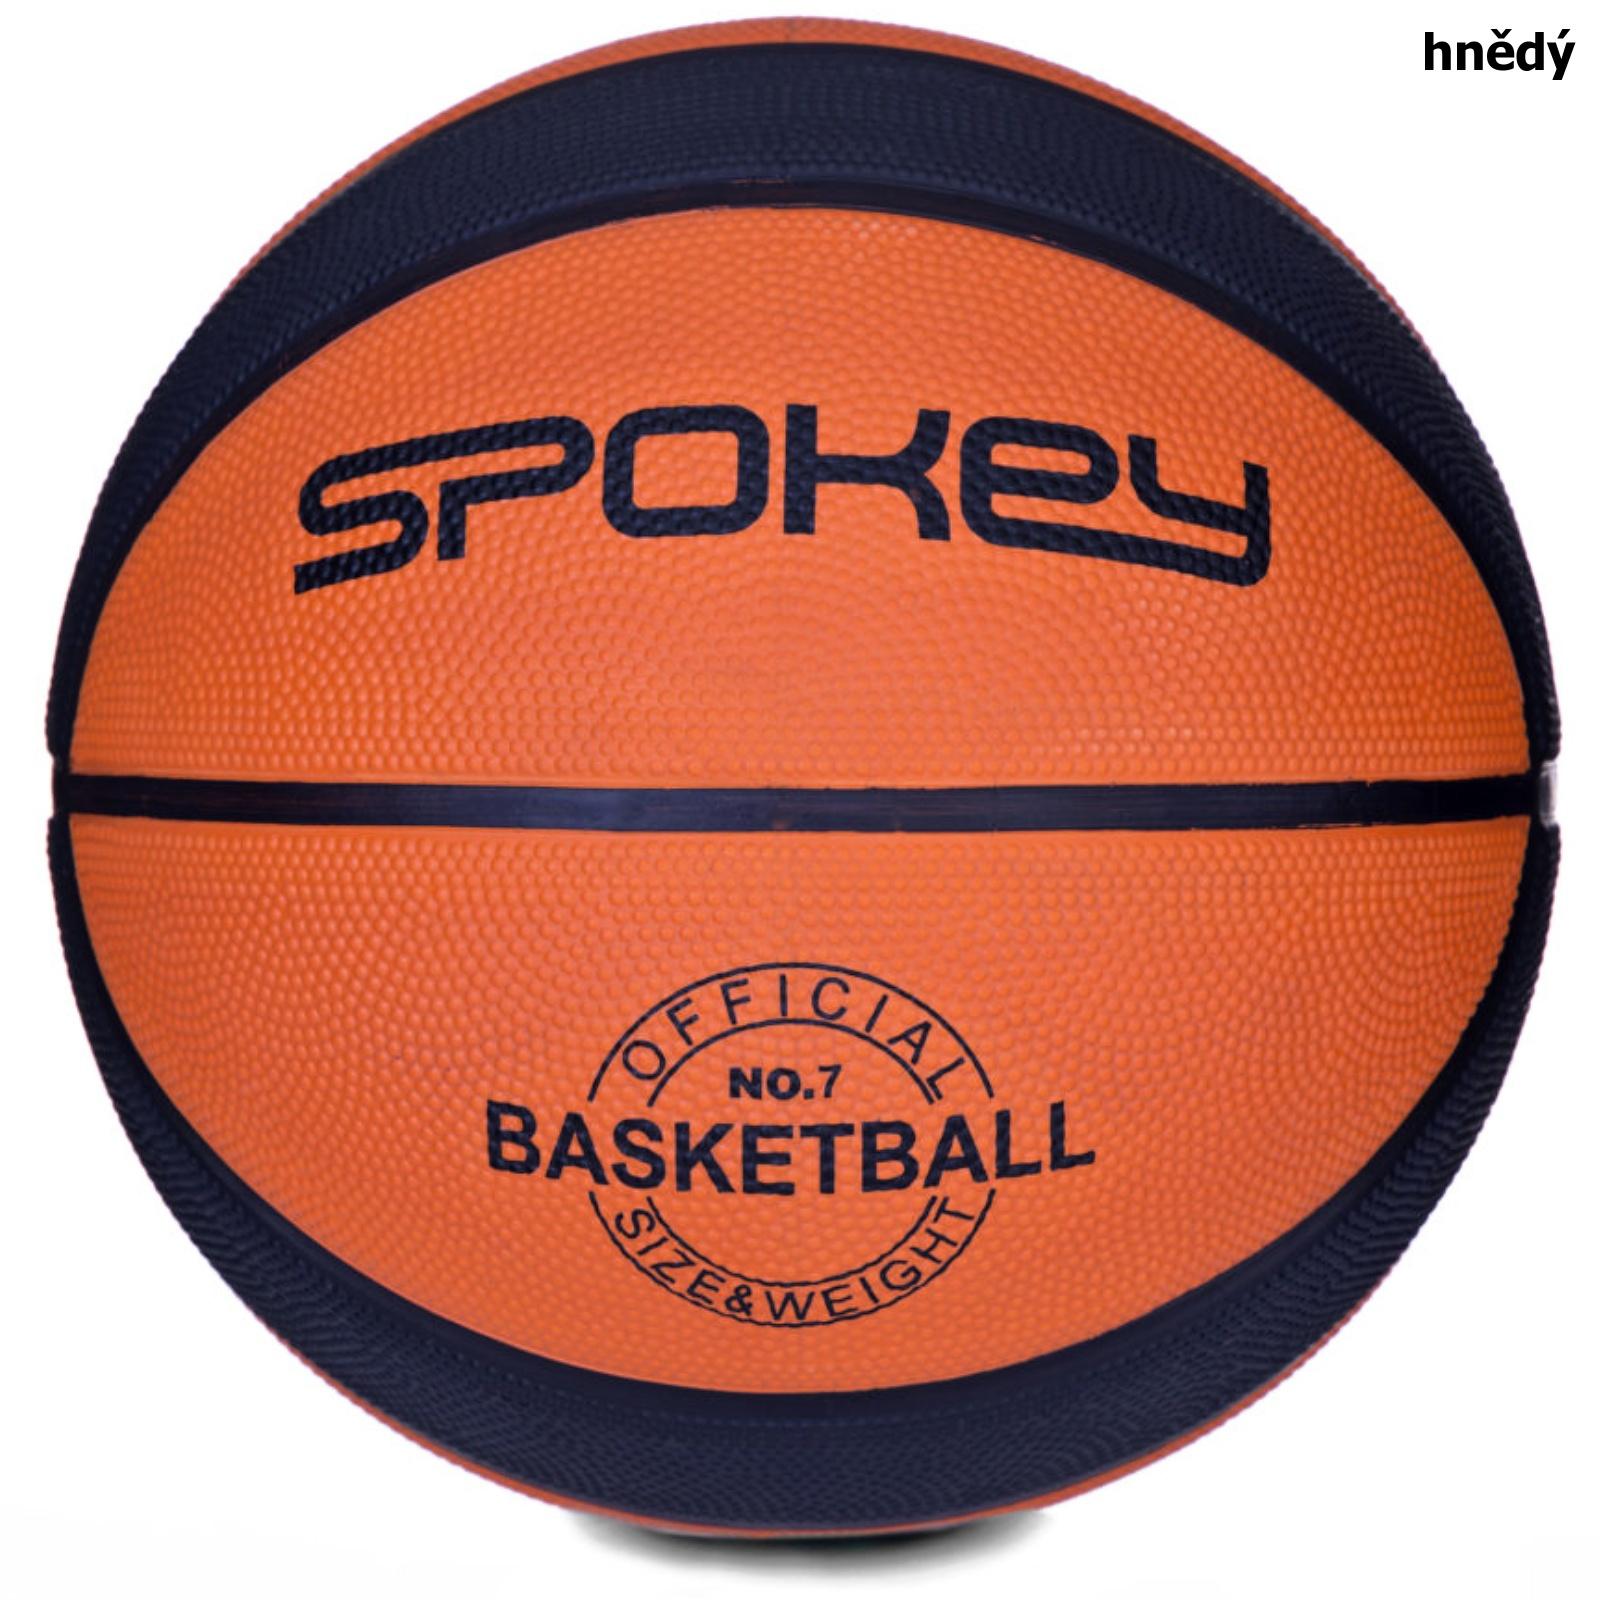 eb2b395e5 Basketbalové lopty | Stojizato.sme.sk